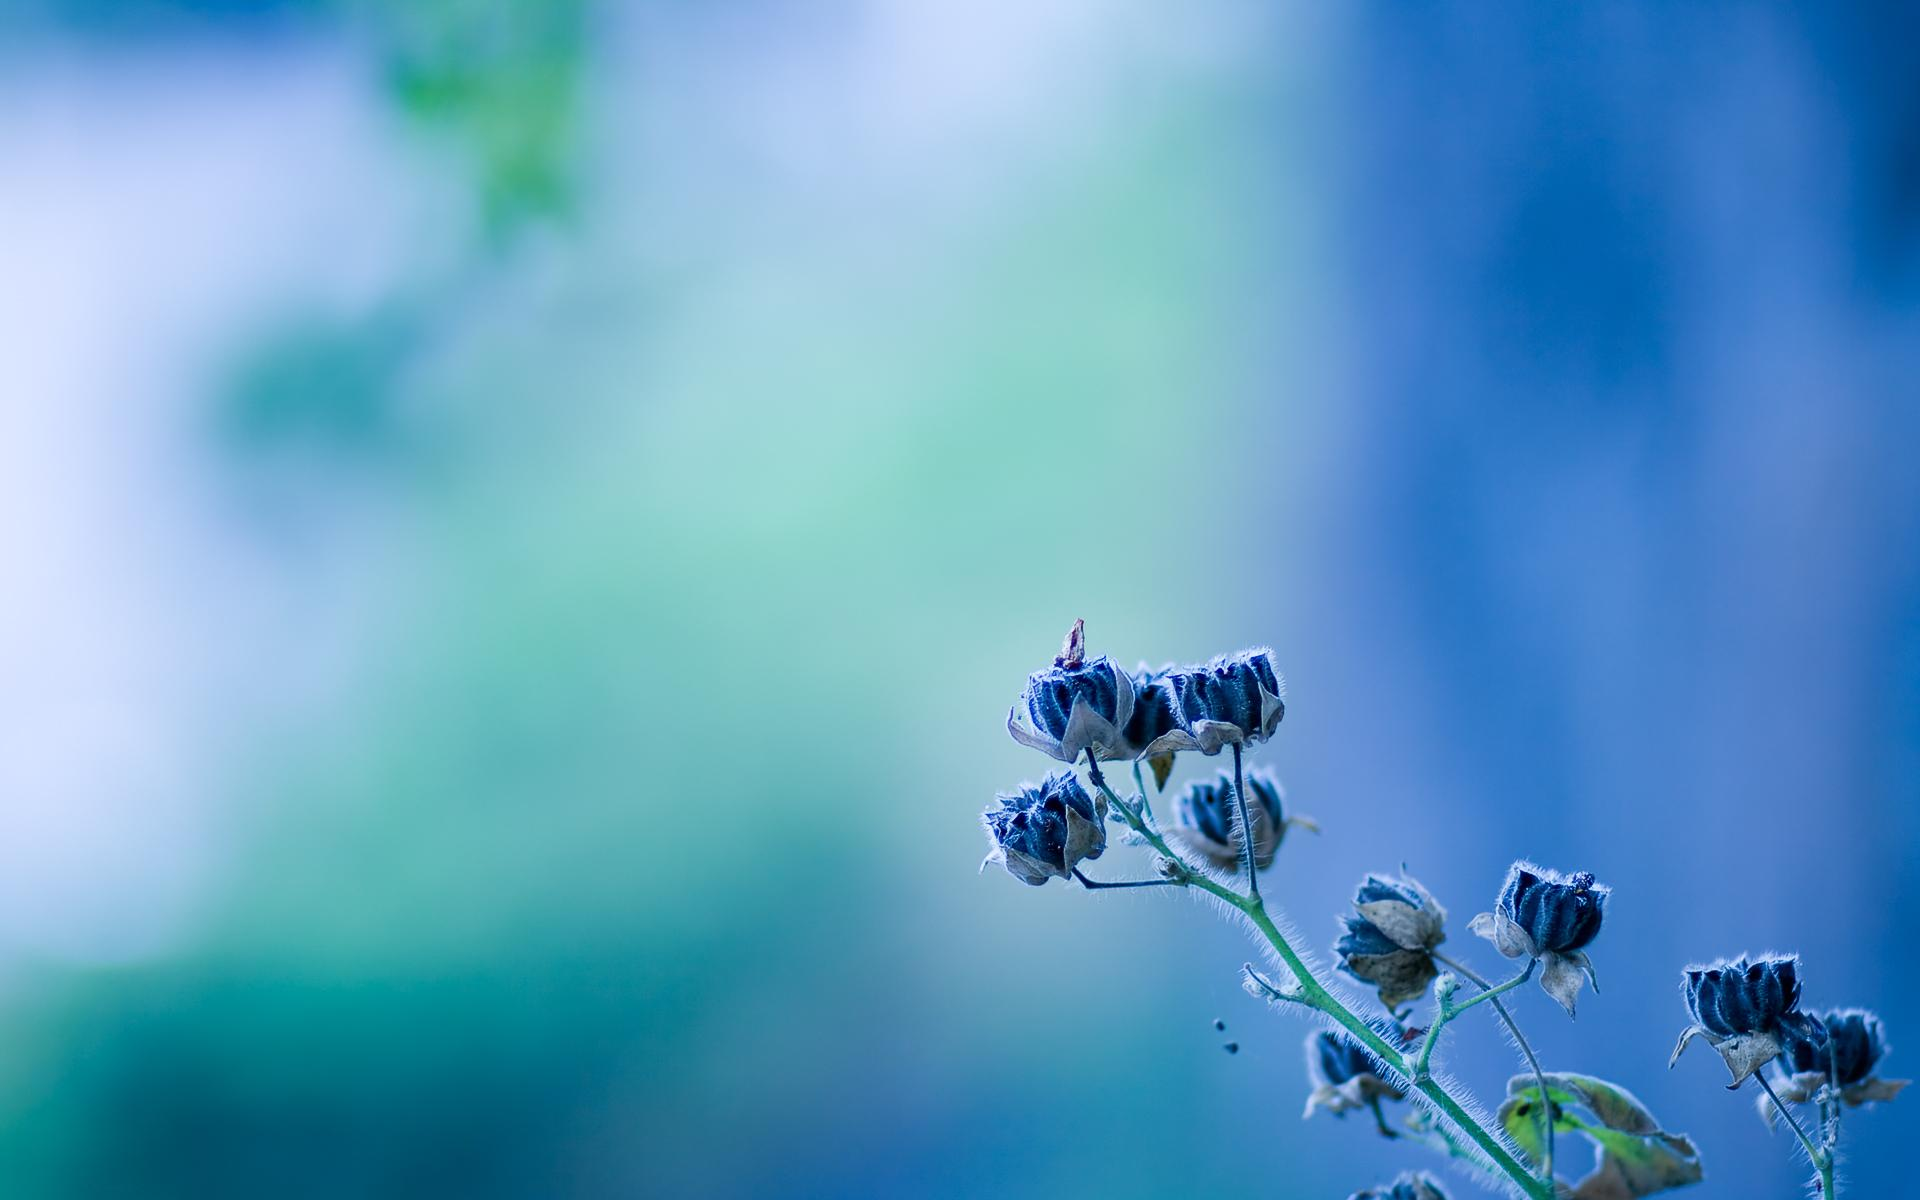 цветок колокольчик фото: